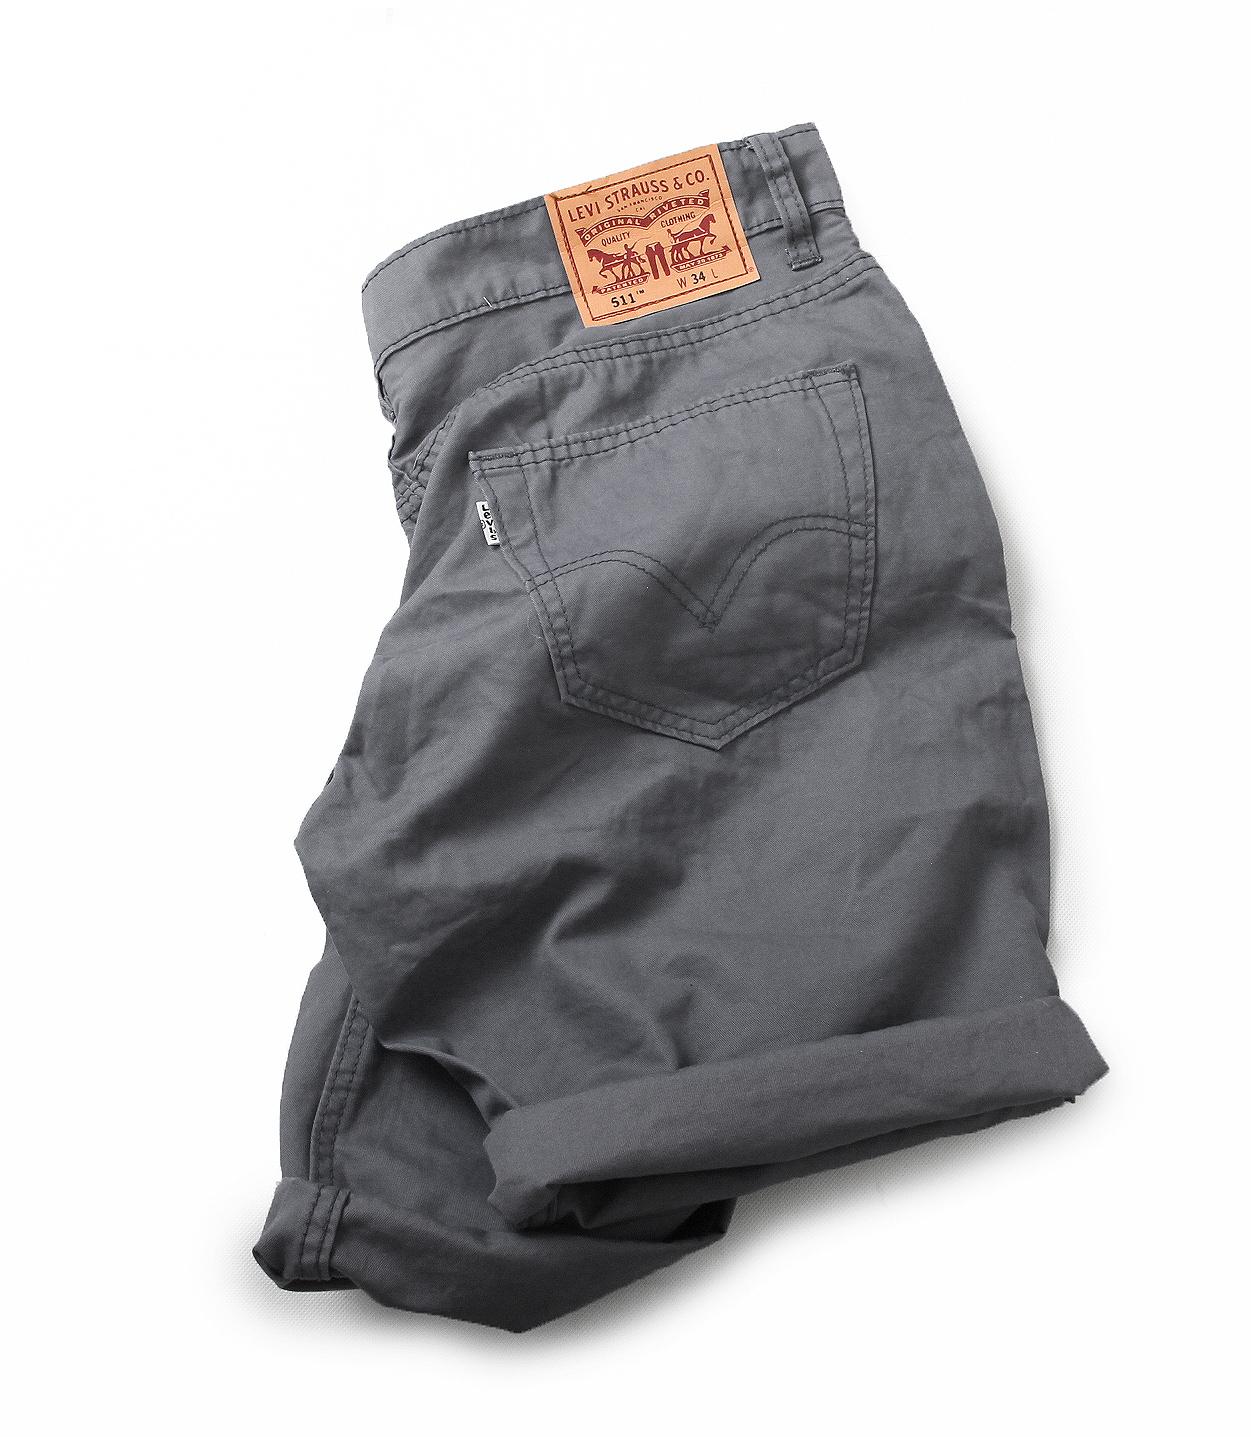 Shop Phan_3t Hàng VNXK origianal !!Zara,celio,nautica,raul lauren...Giá tốt nhất!! - 20